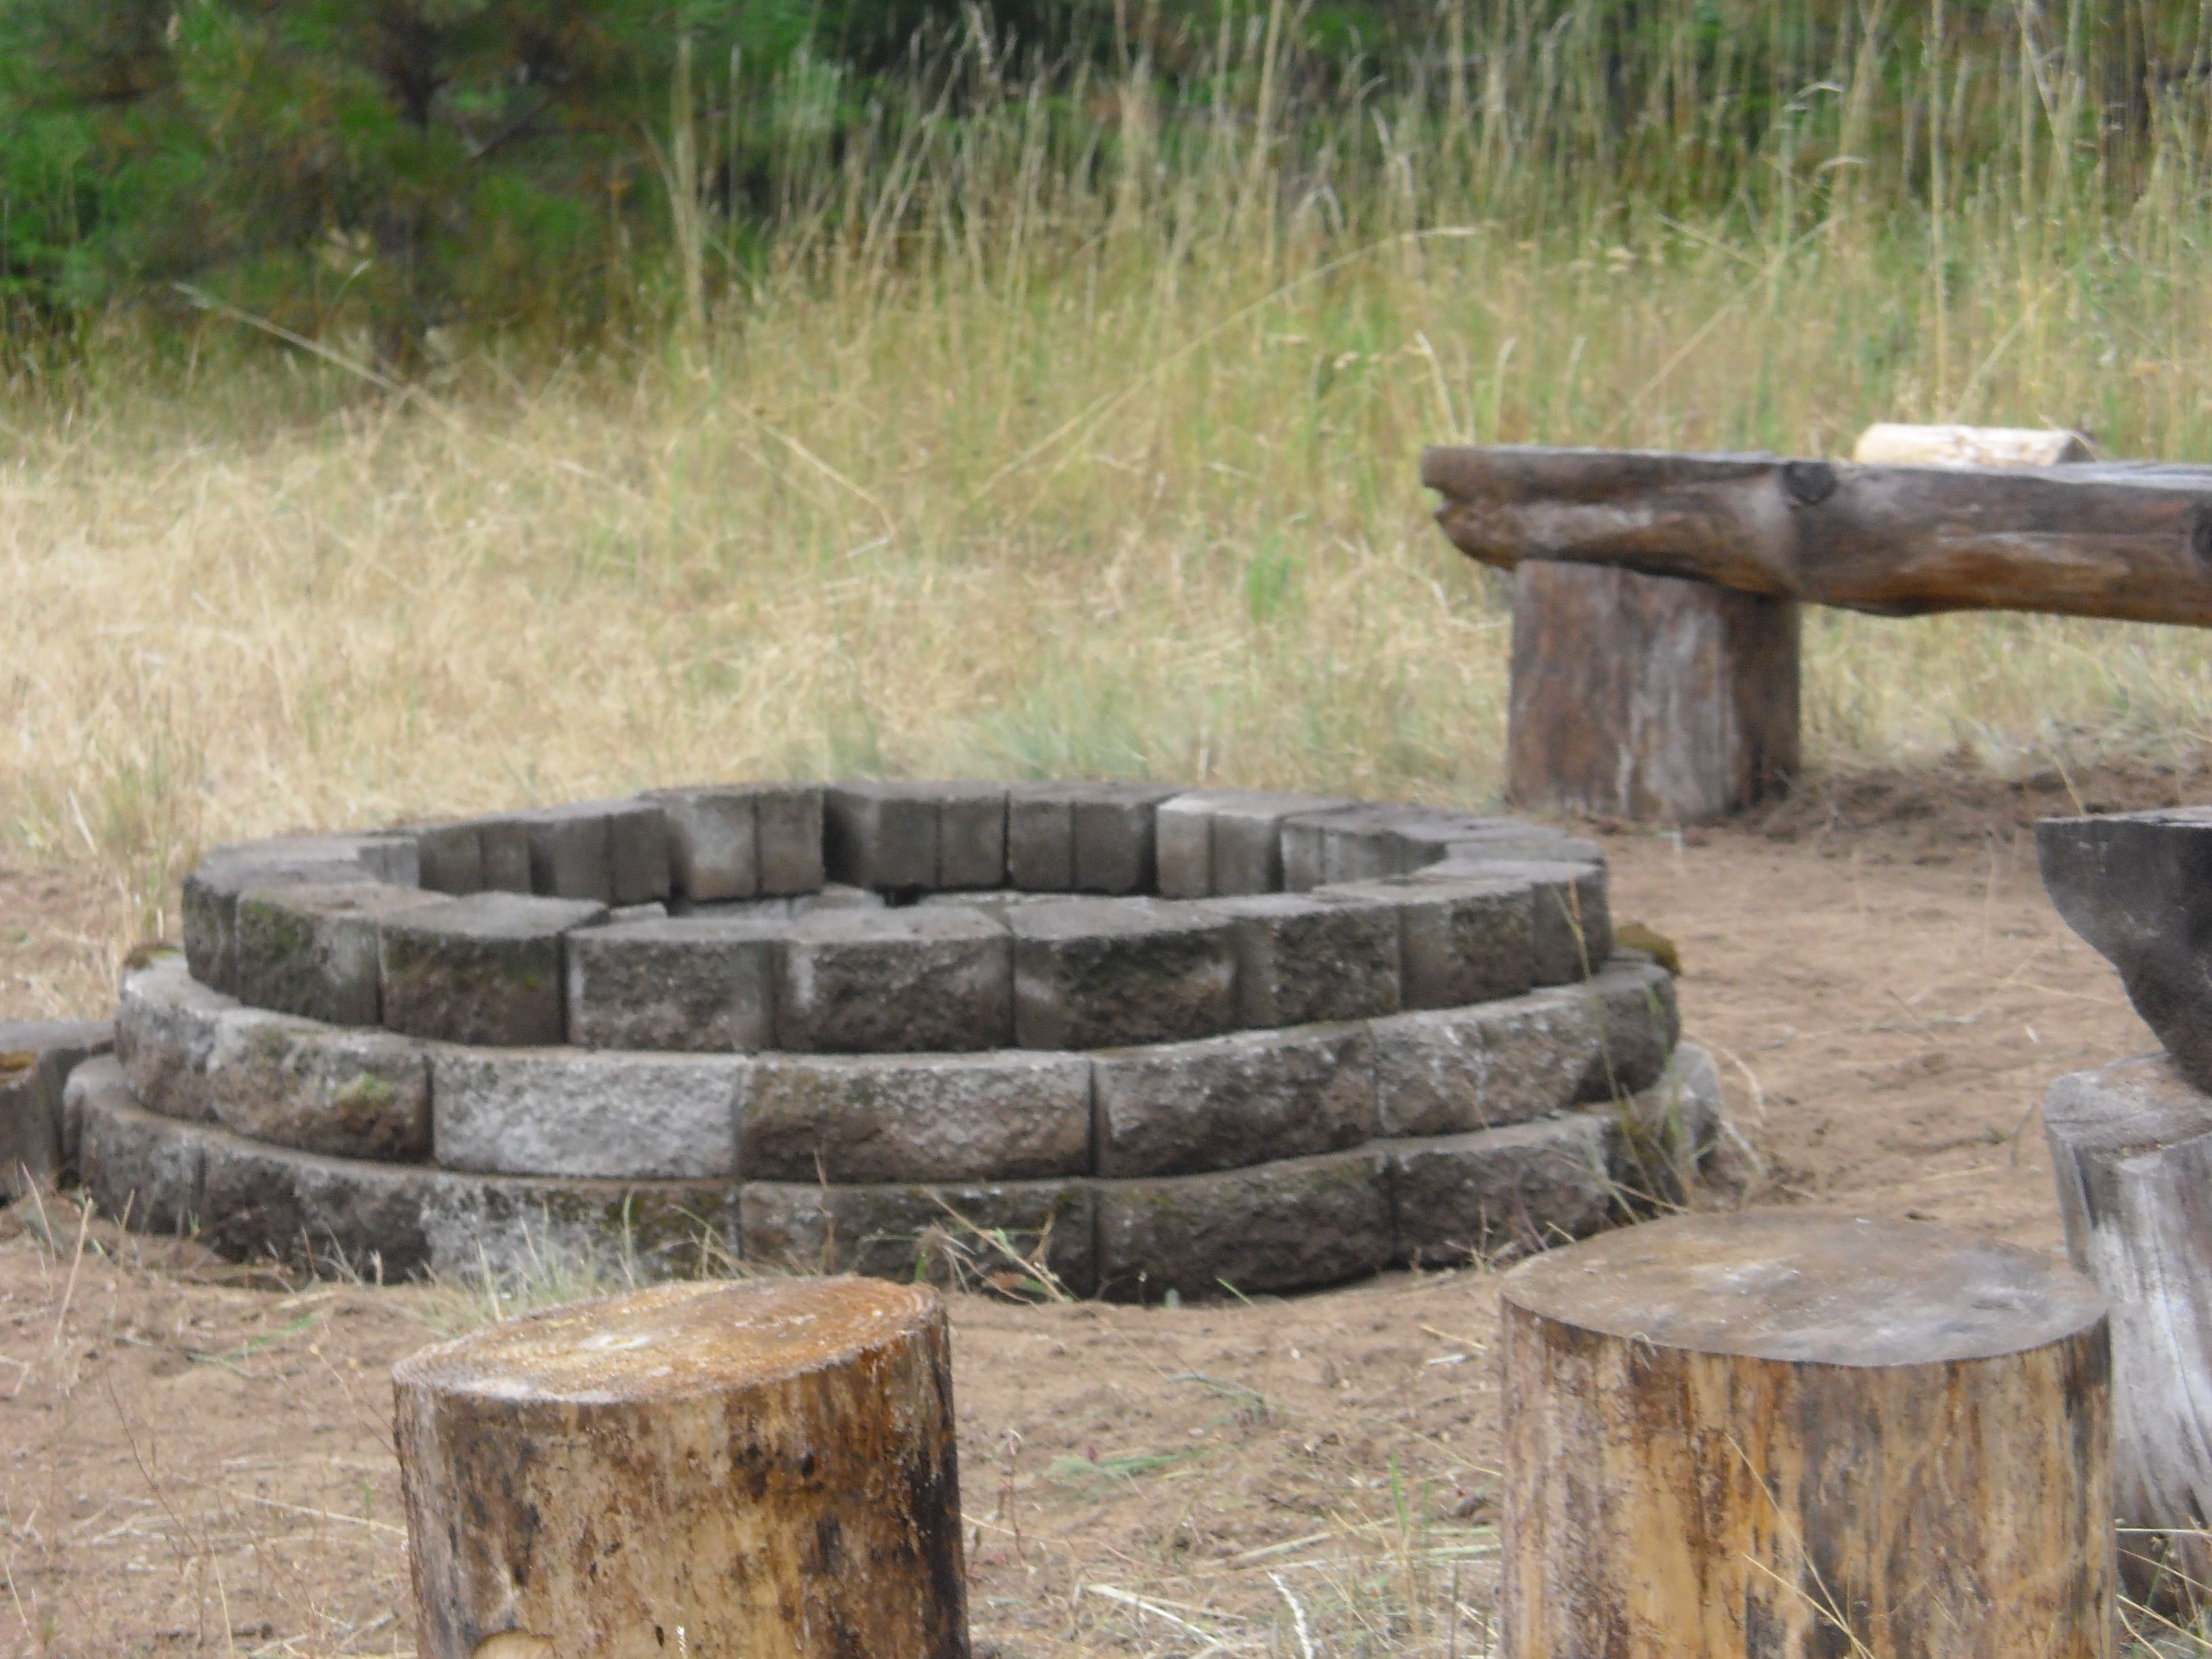 fire pit driftwood seats backyard inspiration pinterest